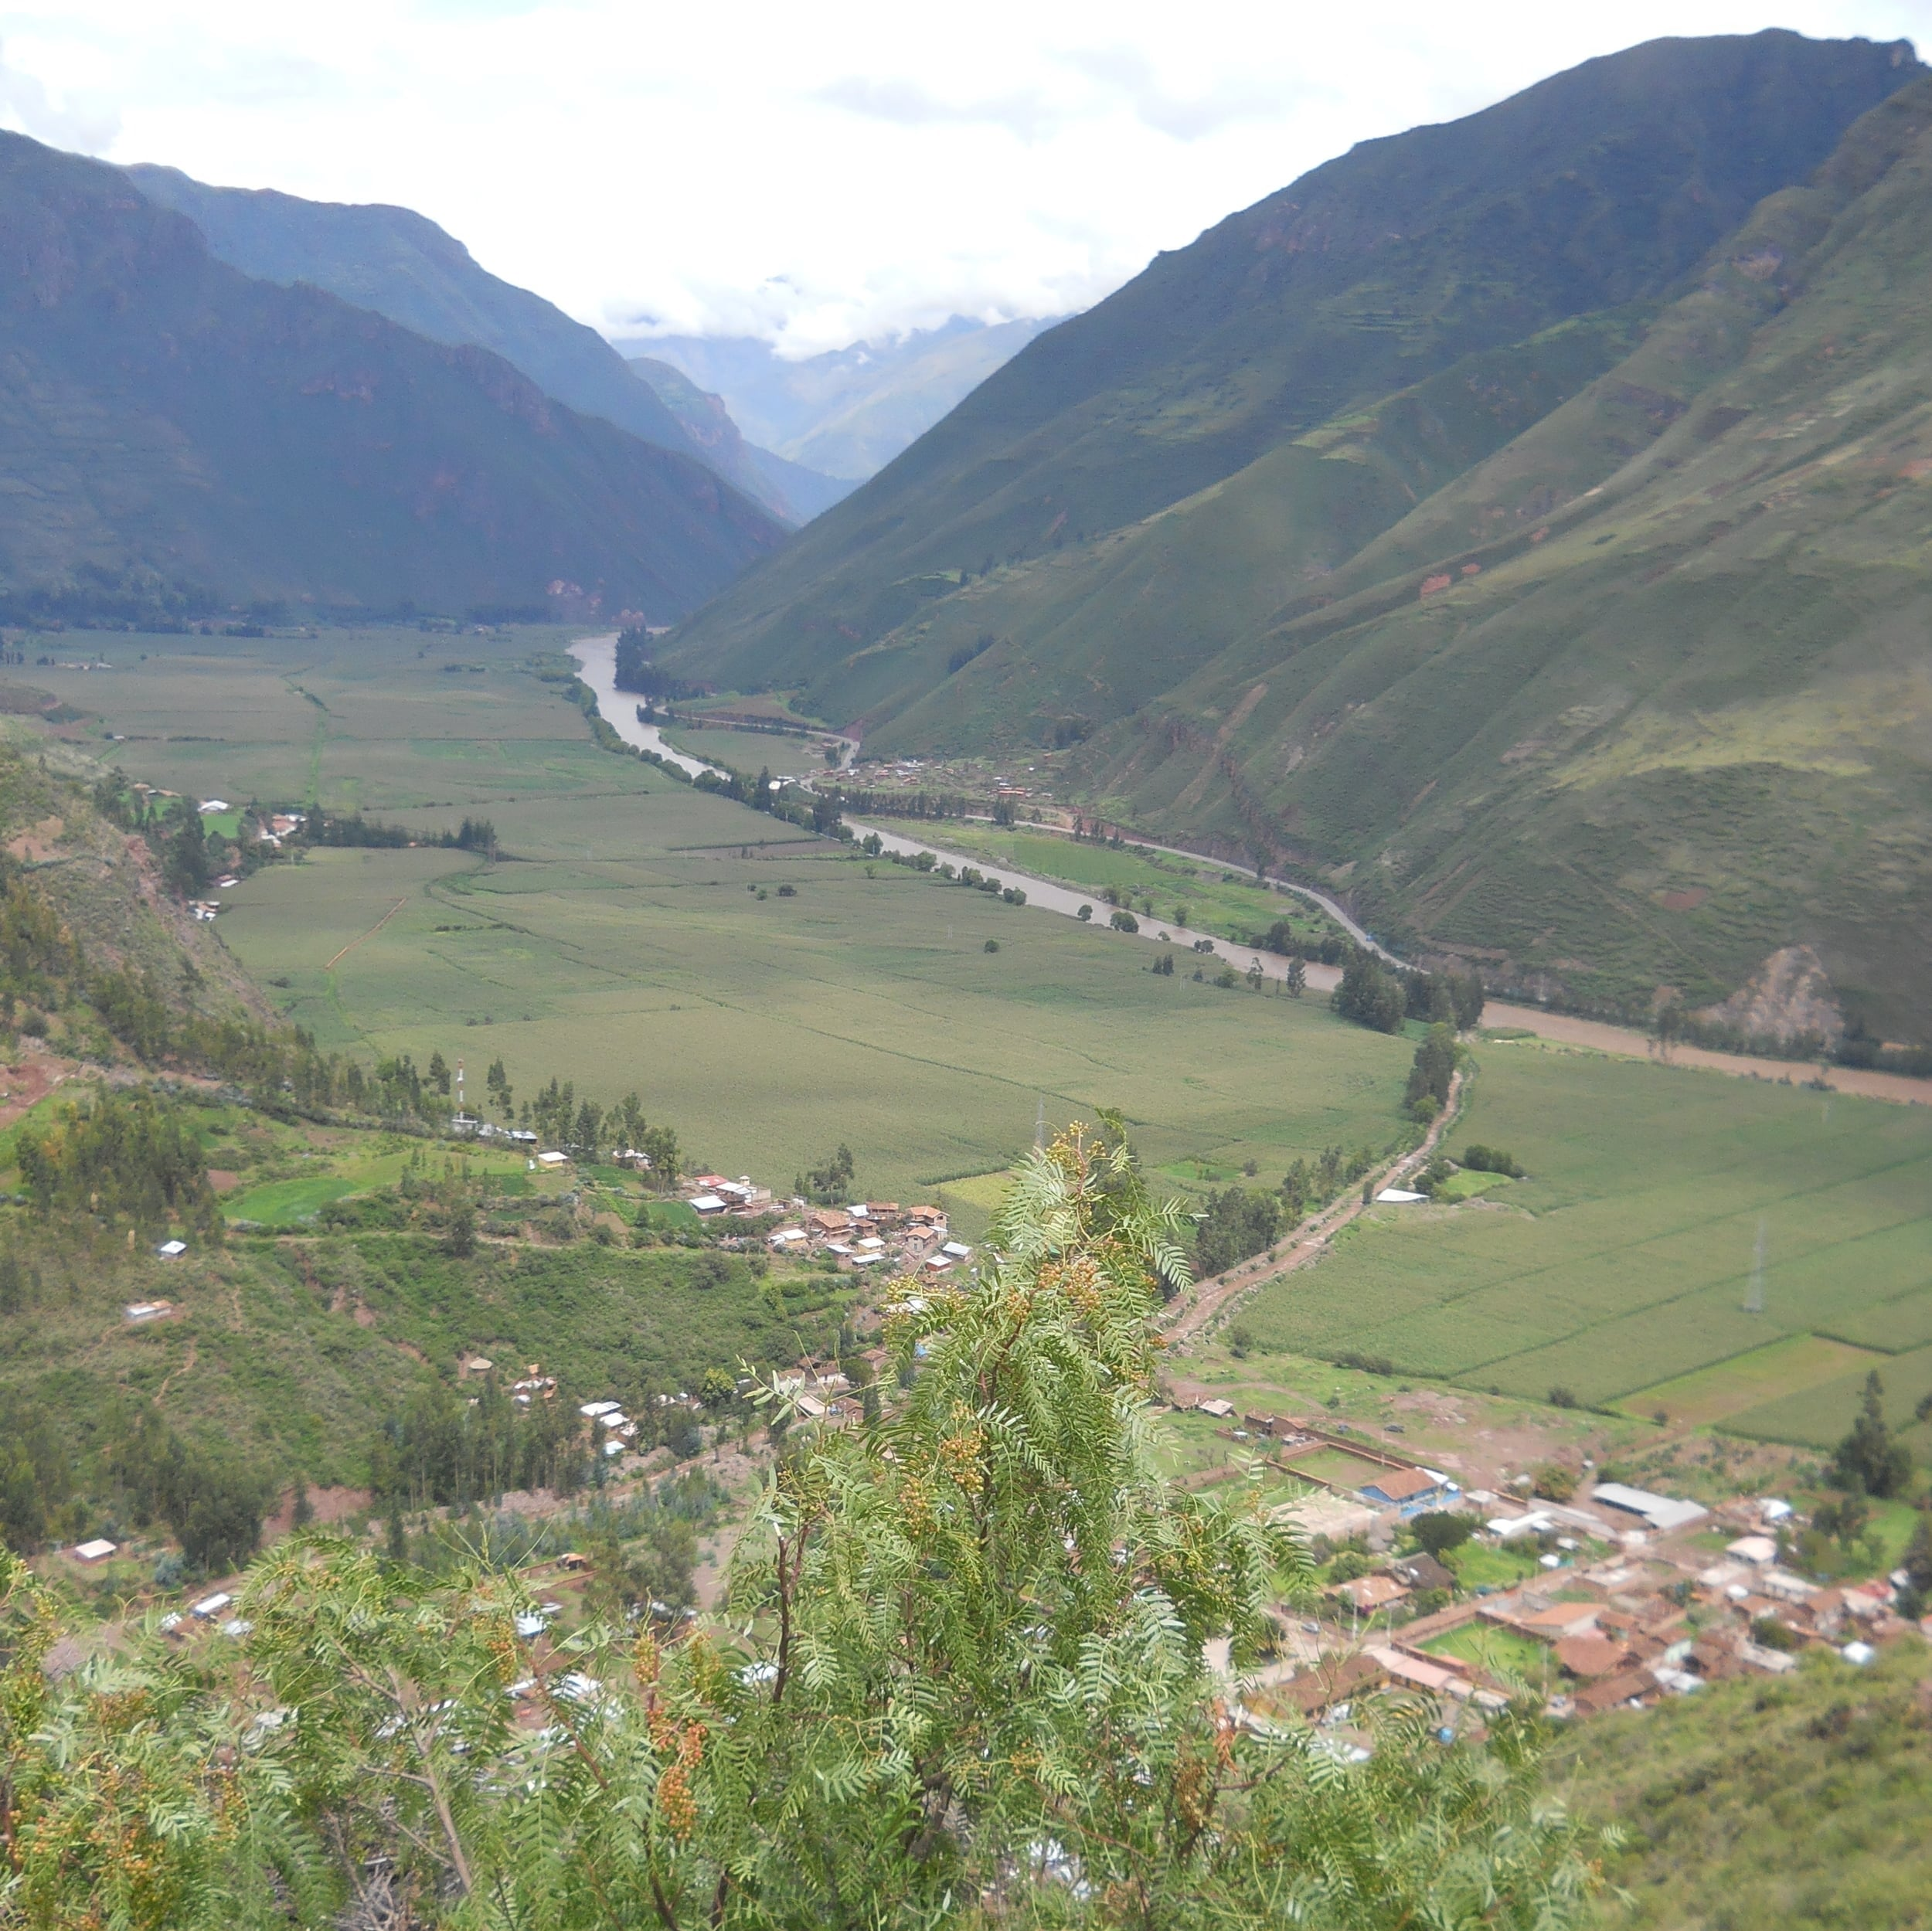 From the Mirador Taray you can contemplate the Sacred Valley. Photo: Fernando J. Rojas